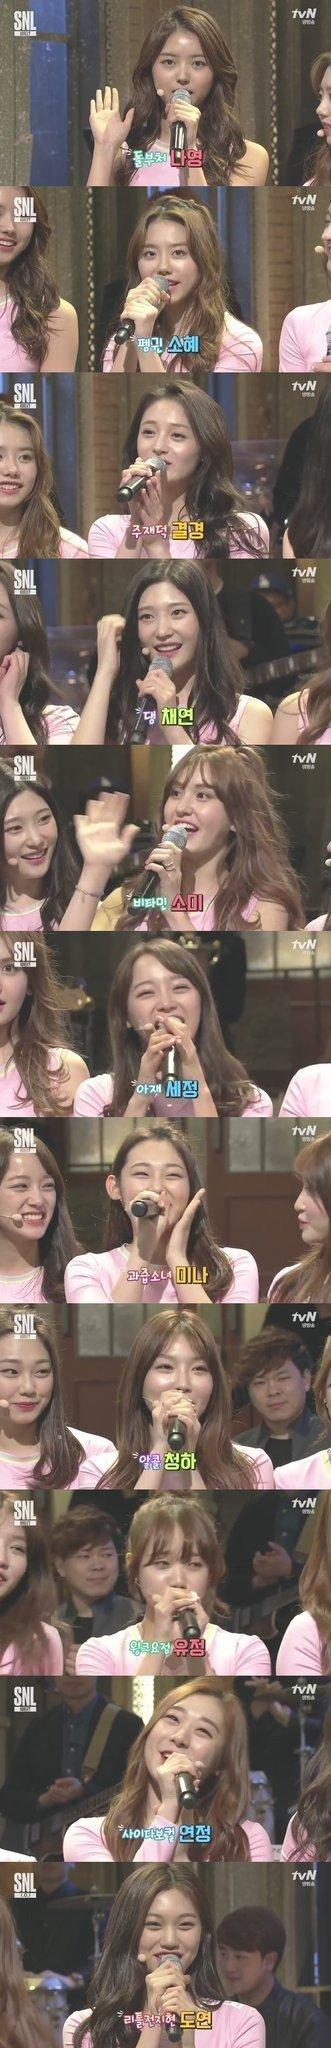 Image: SNL Korea 7 / tvN